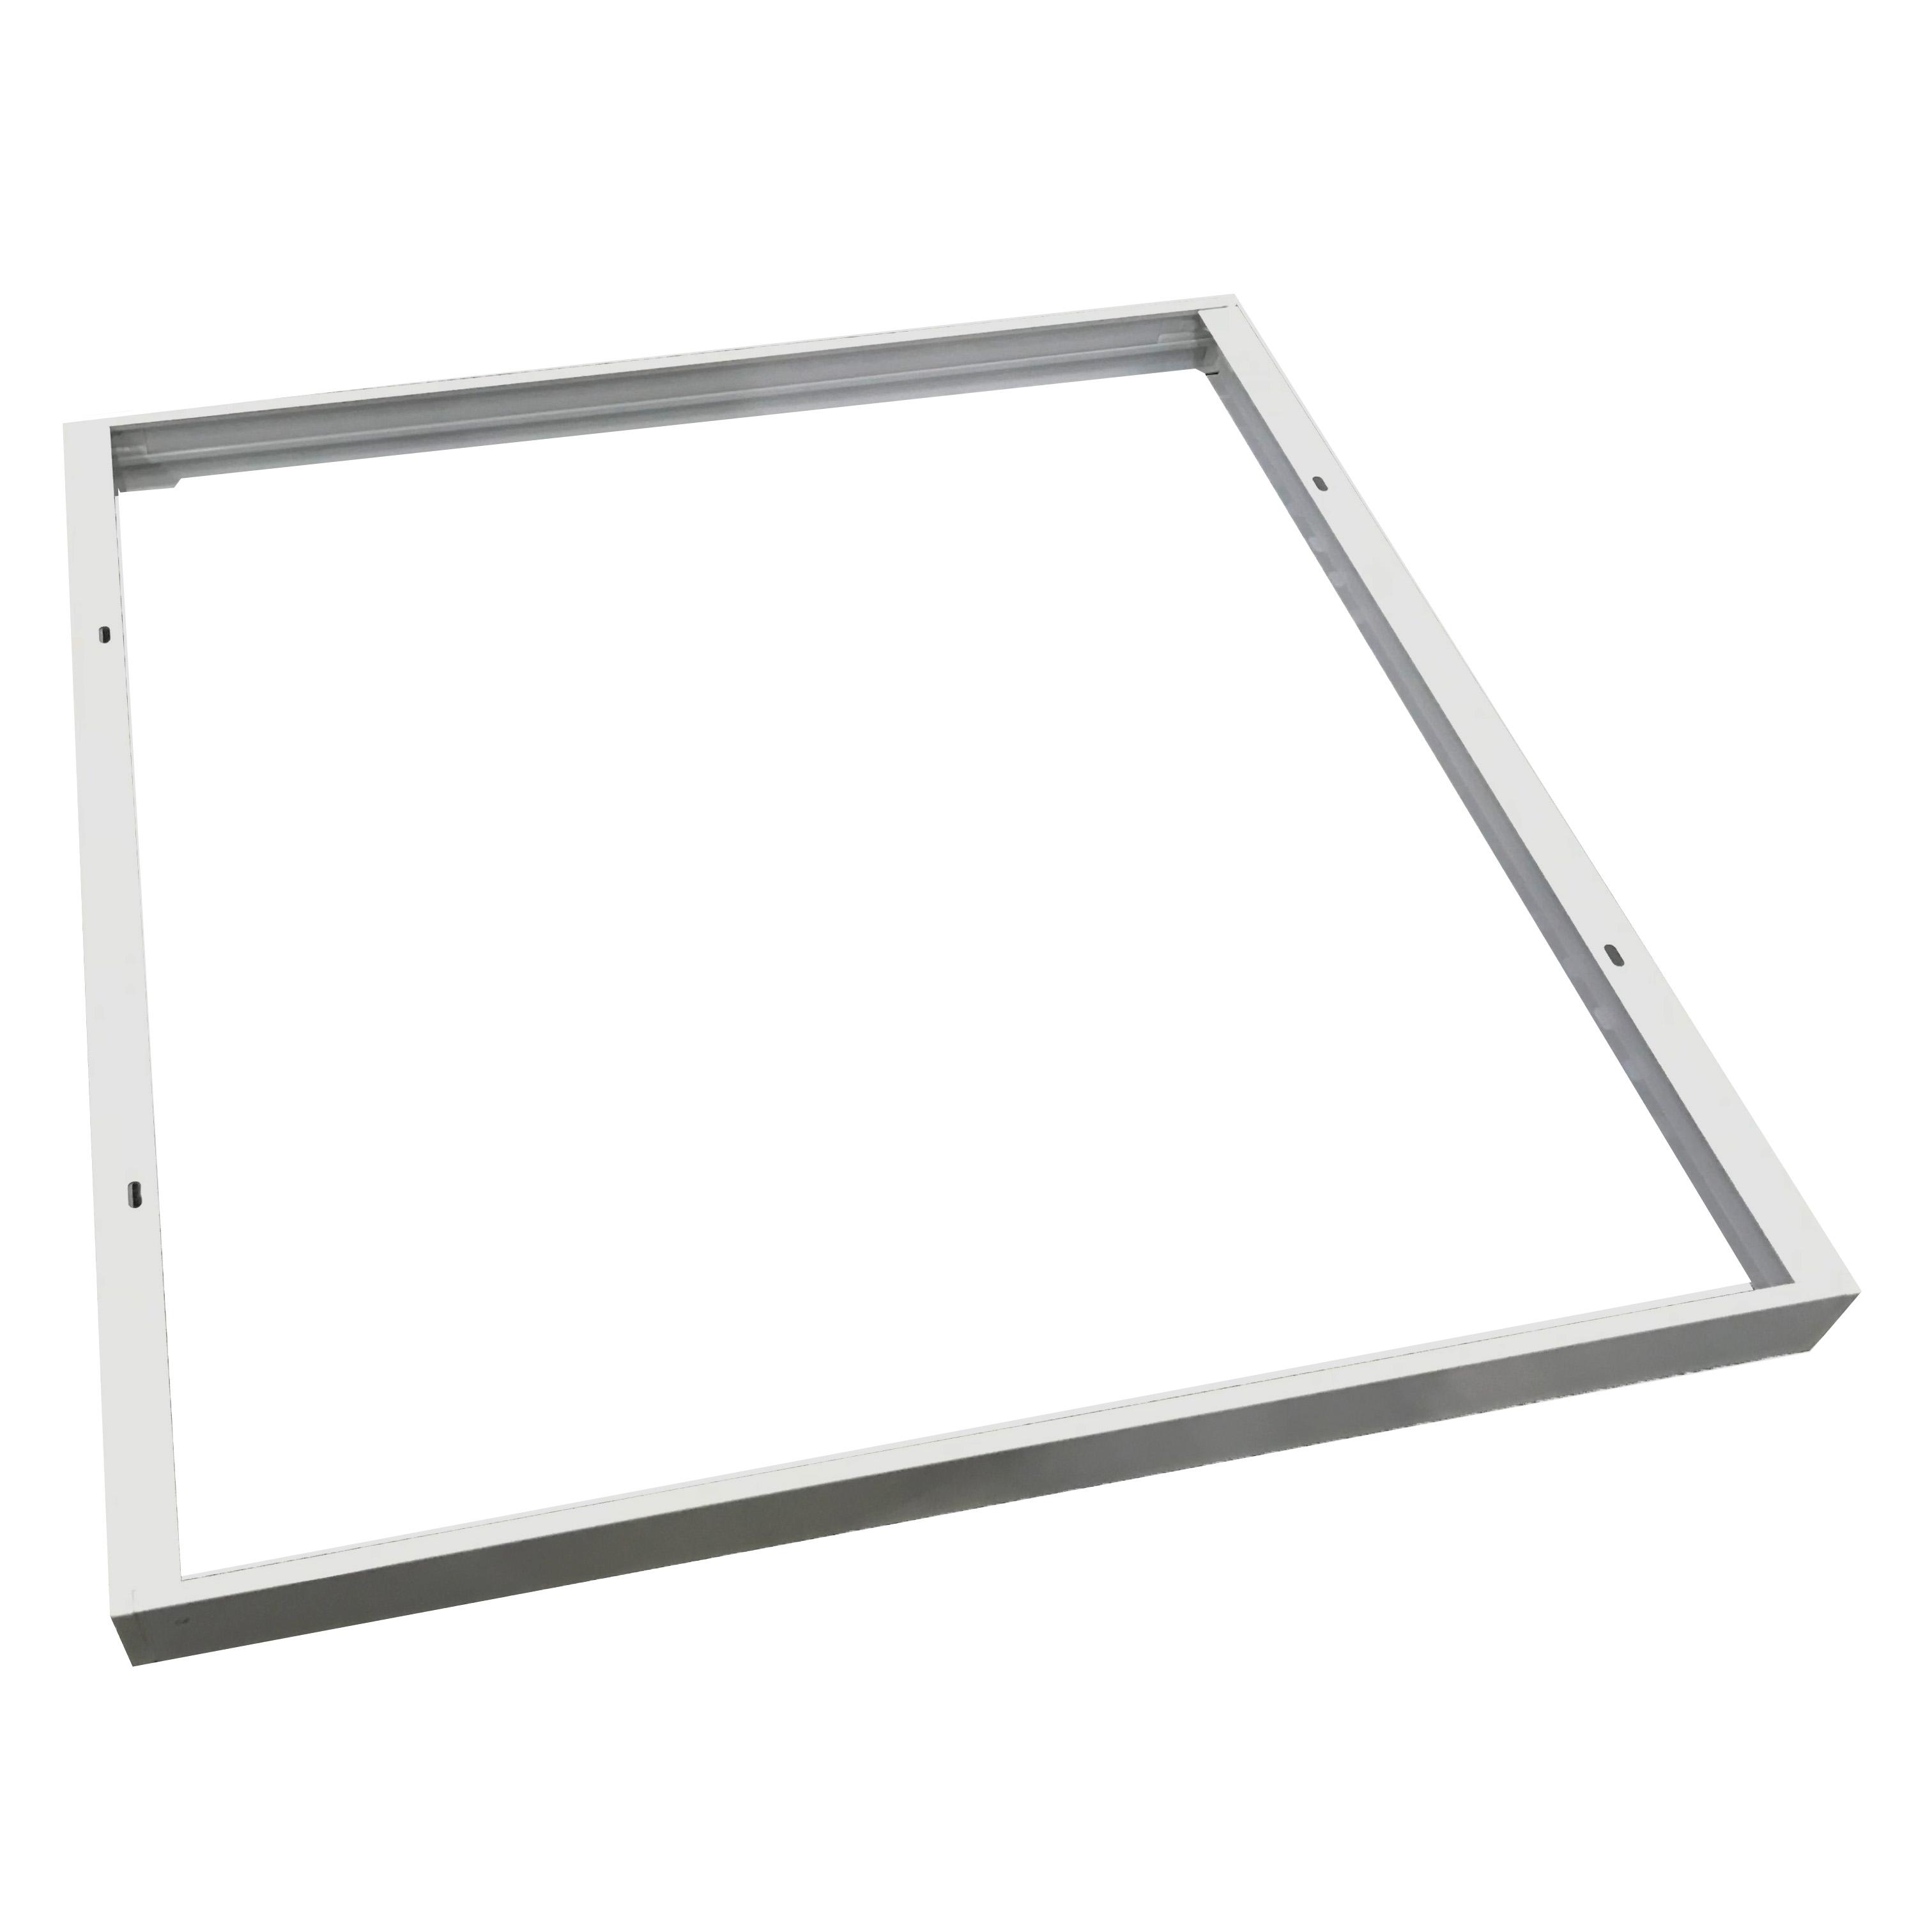 1 Stk Aufbaurahmen für LED Panels Serie Lano 4 LED M1200 und M1250 LITP0027--